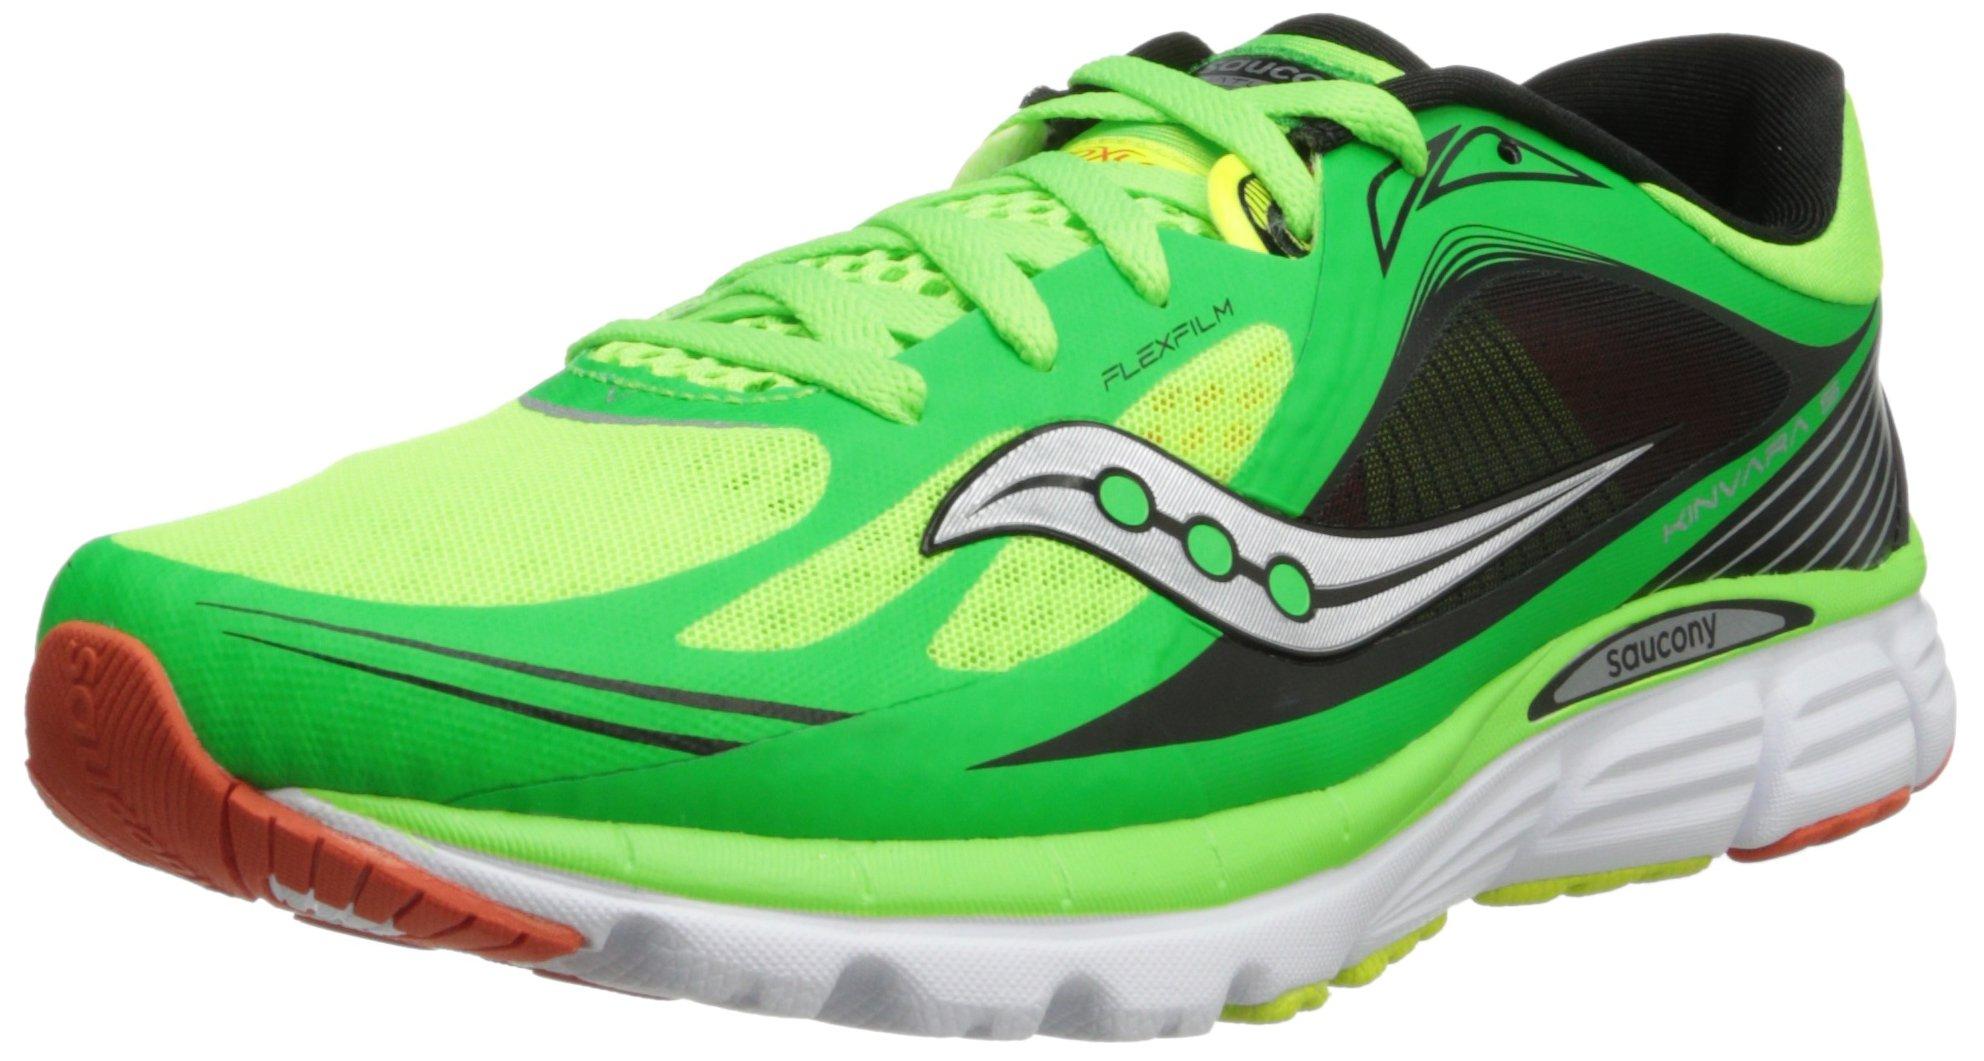 Saucony Men's Kinvara 5 Running Shoe,SlimeOrangeCitron,10 M US